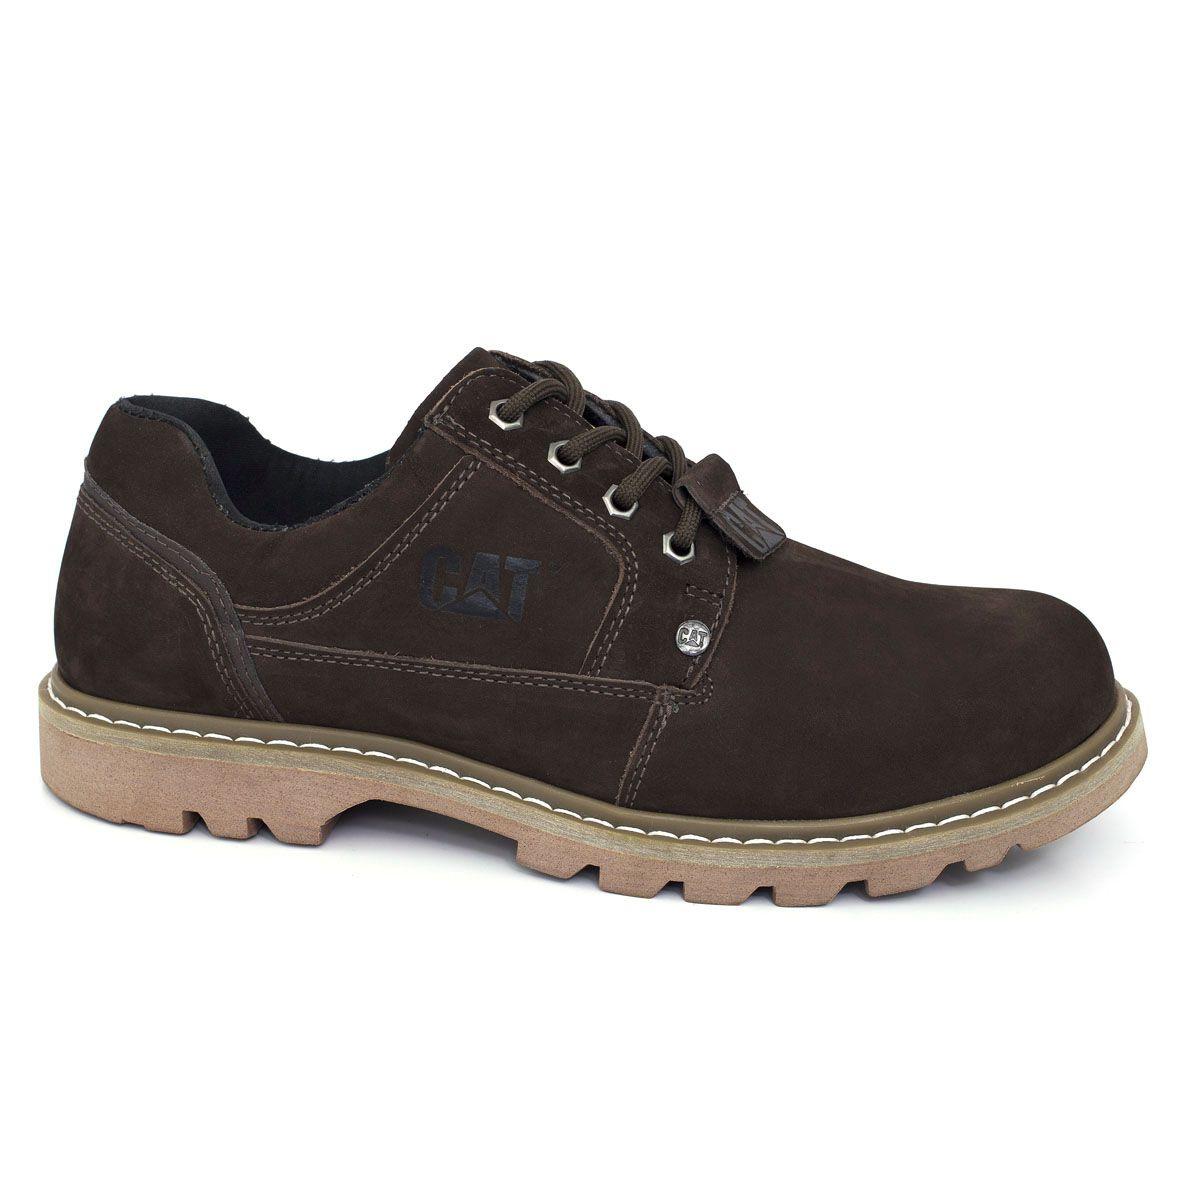 Sapato Tênis Caterpillar Masculina Second Shift  Couro - Brown